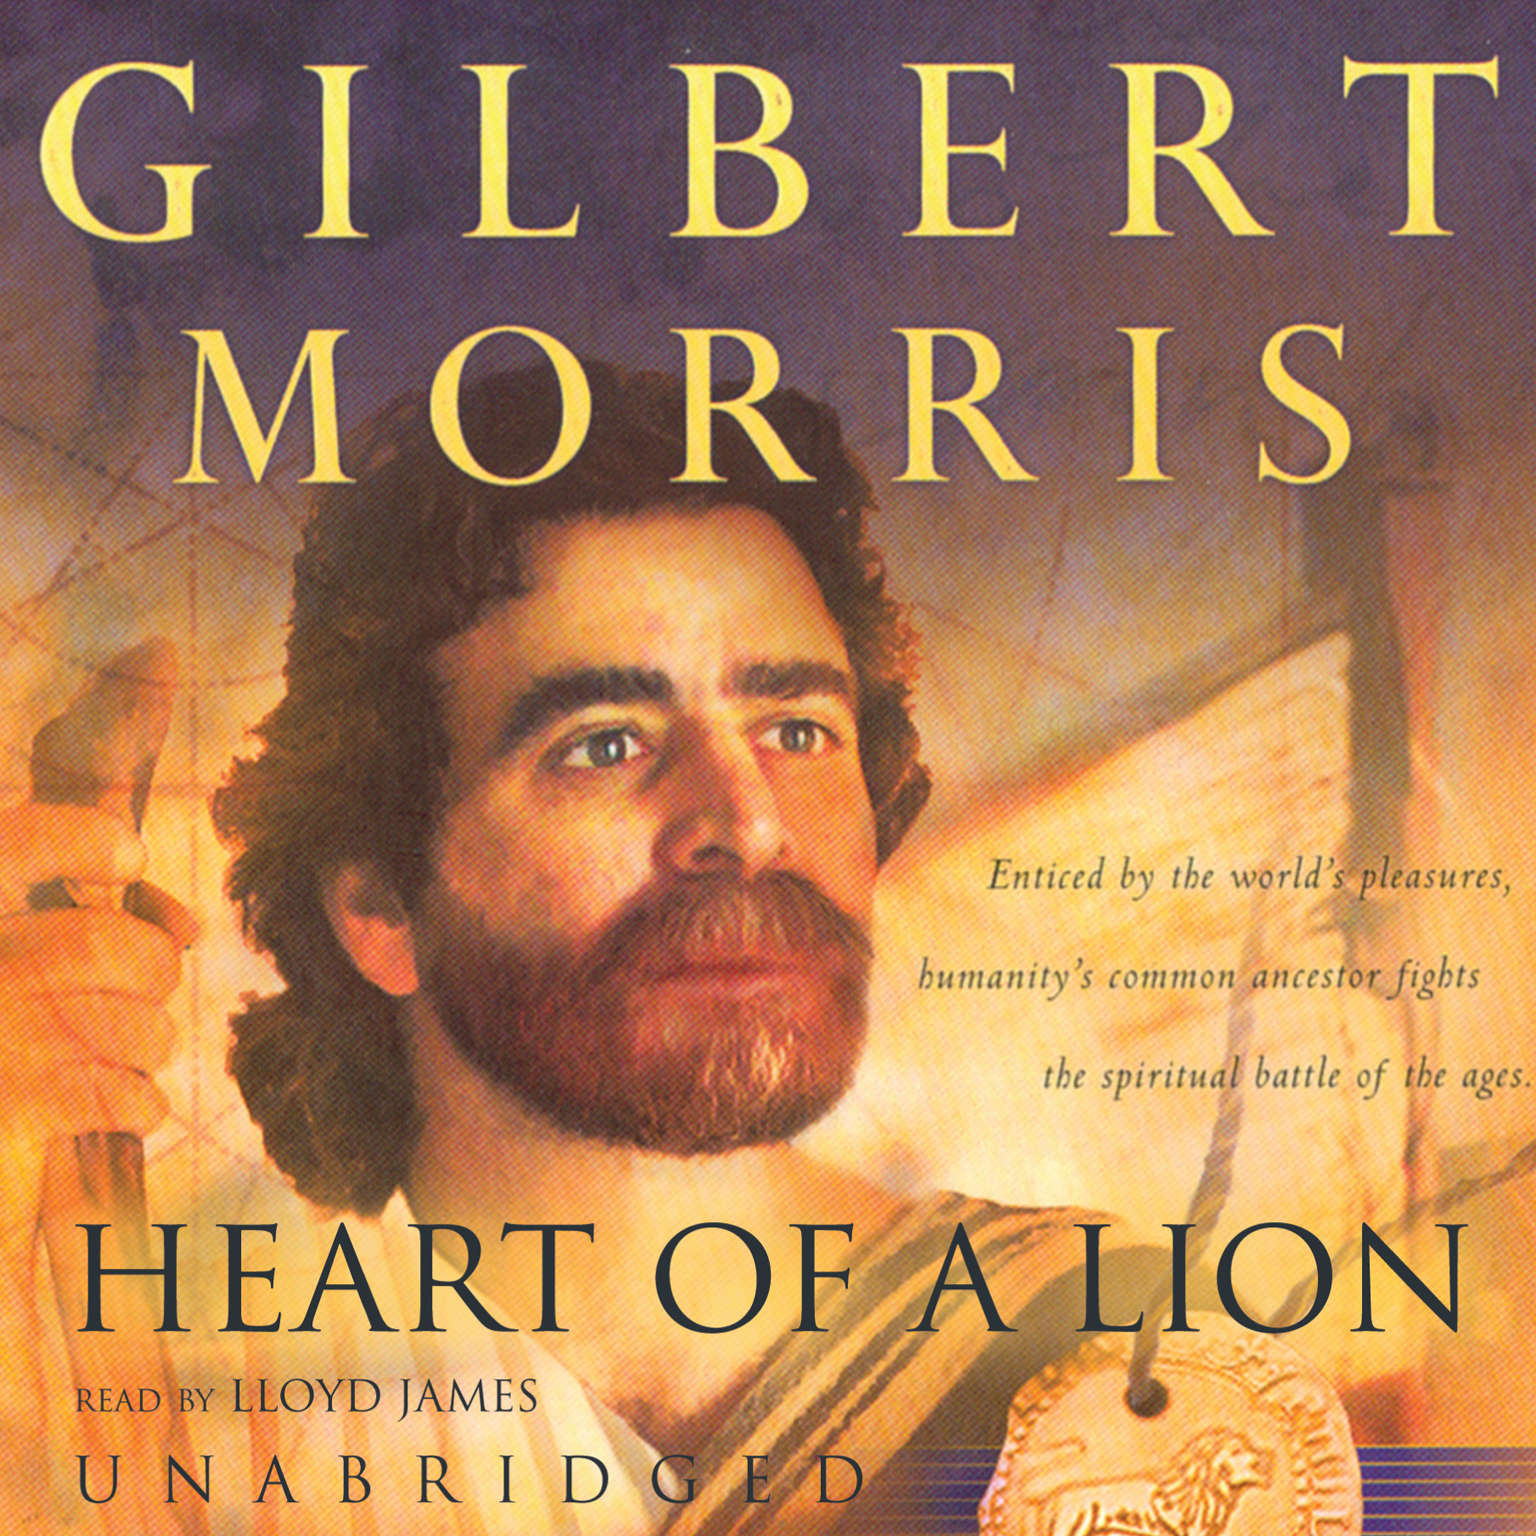 Heart of a Lion Audiobook, by Gilbert Morris